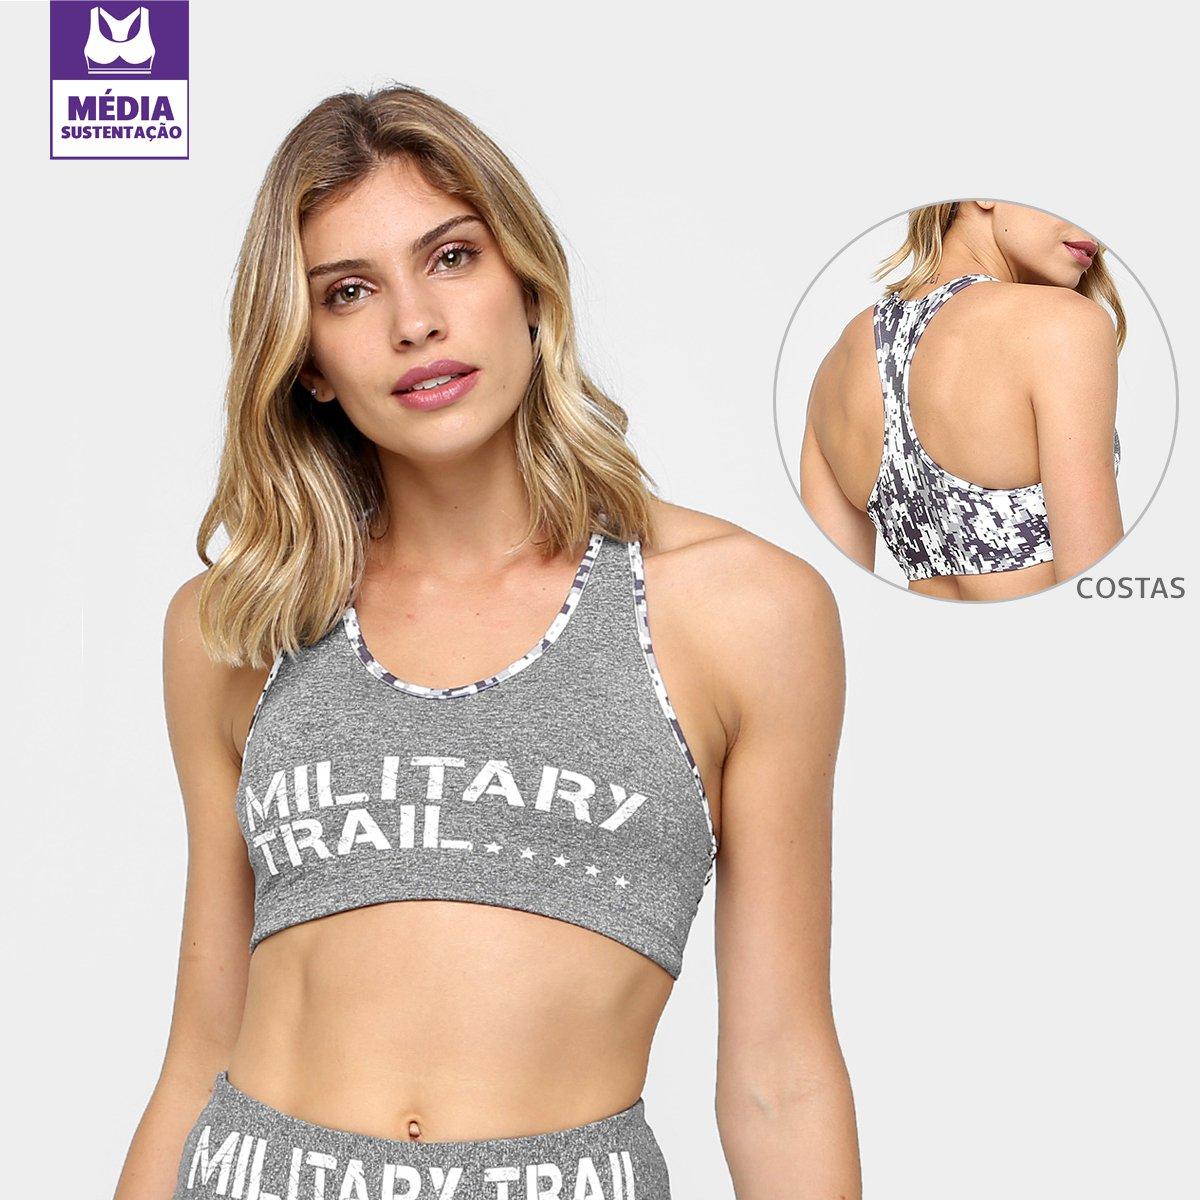 Midway Top Sustenção Branco Cinza Military USA e Trail Média rII5waq